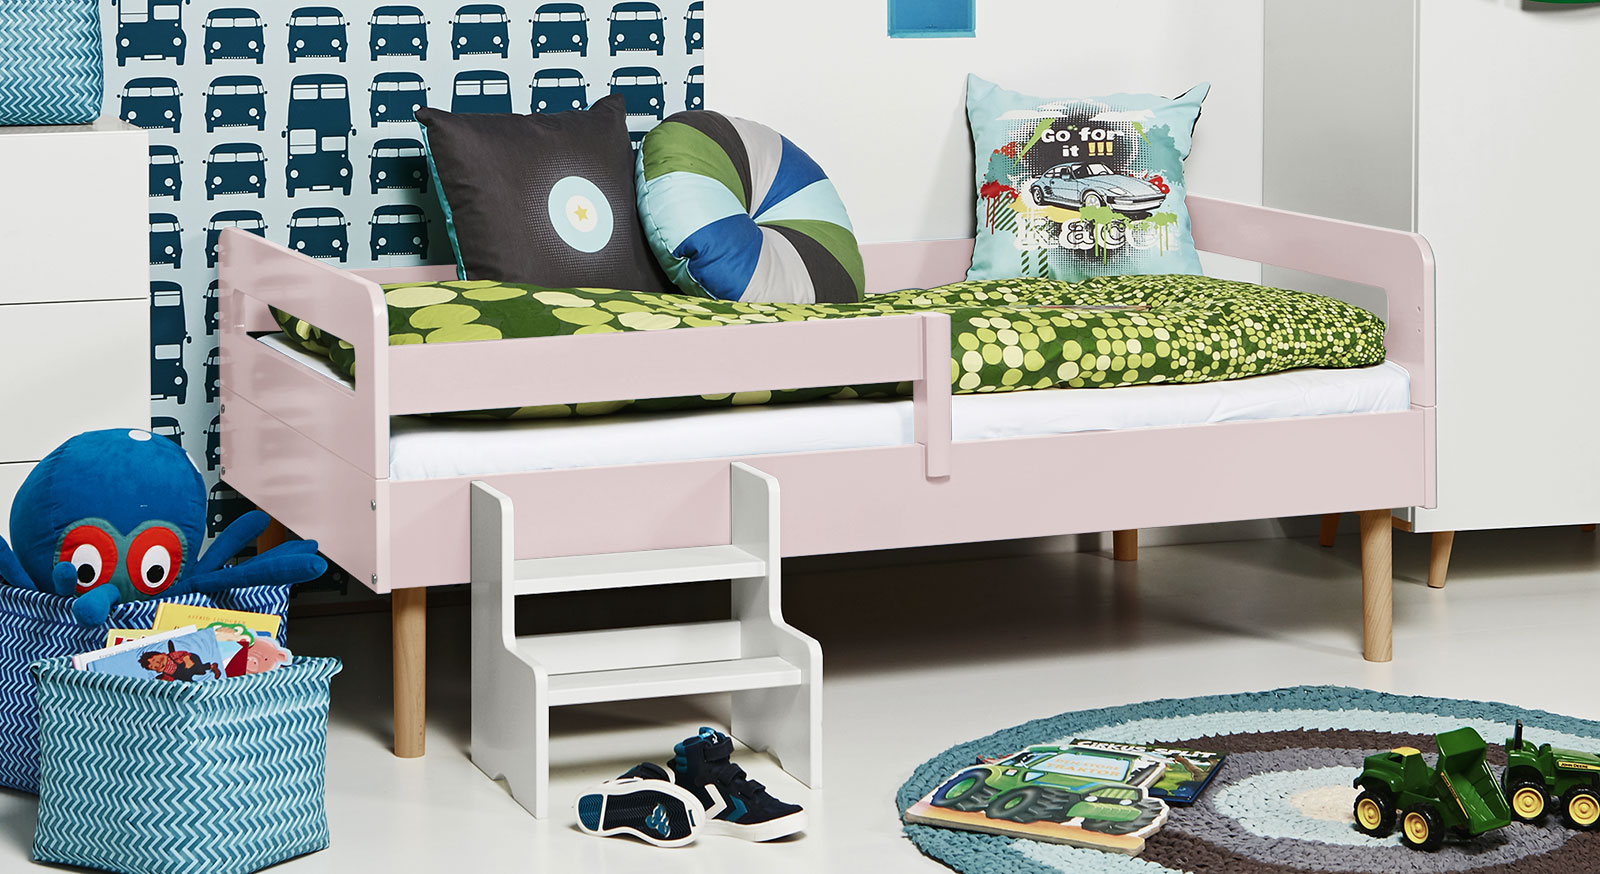 Full Size of Kinderbett Mit Rolllattenrost In 90x160 Cm Kids Town Retro Coole Betten T Shirt Sprüche T Shirt Wohnzimmer Coole Kinderbetten